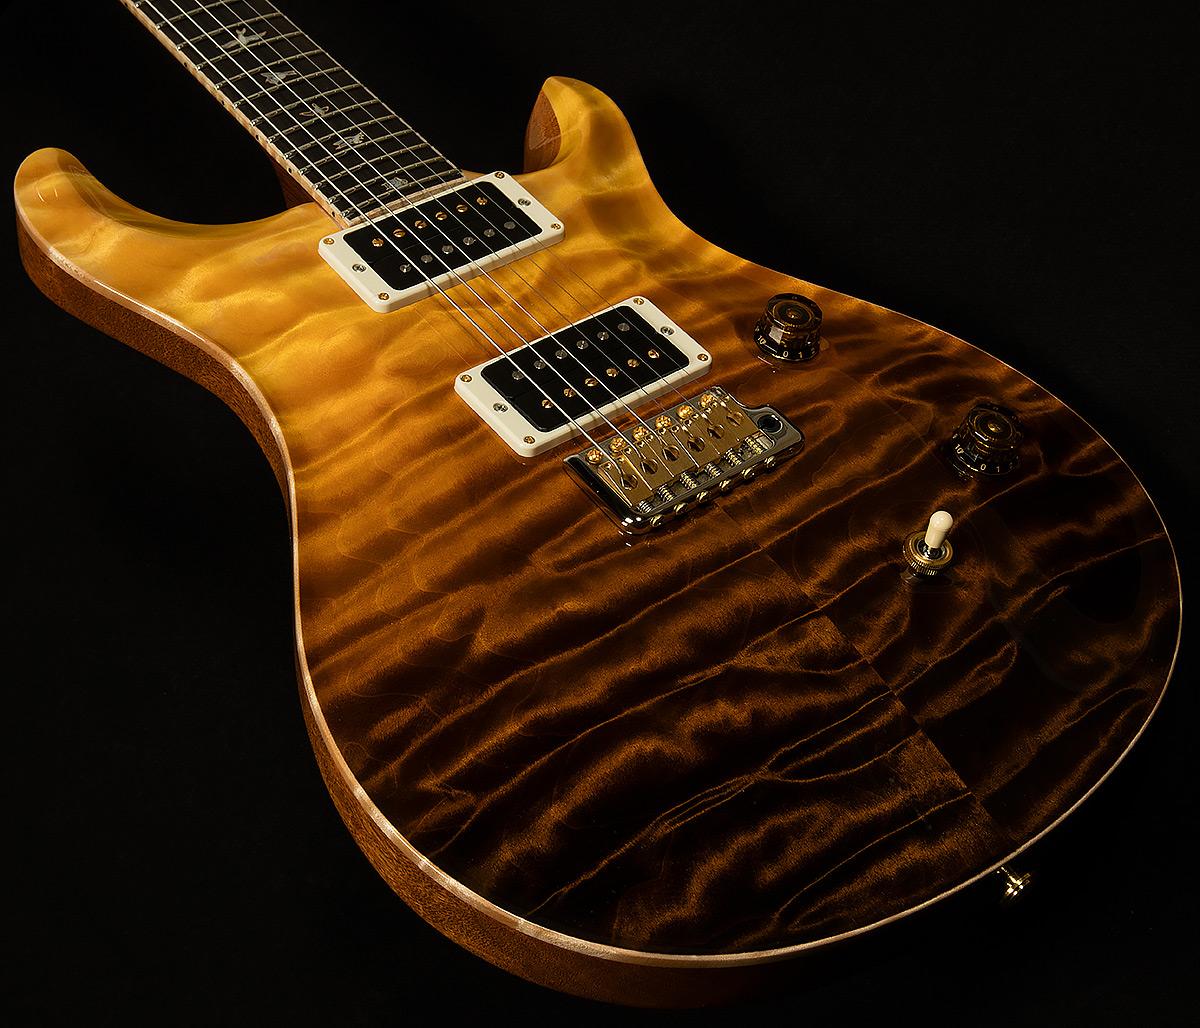 Guitar – PRS Guitars Private Stock Custom 24 Retro